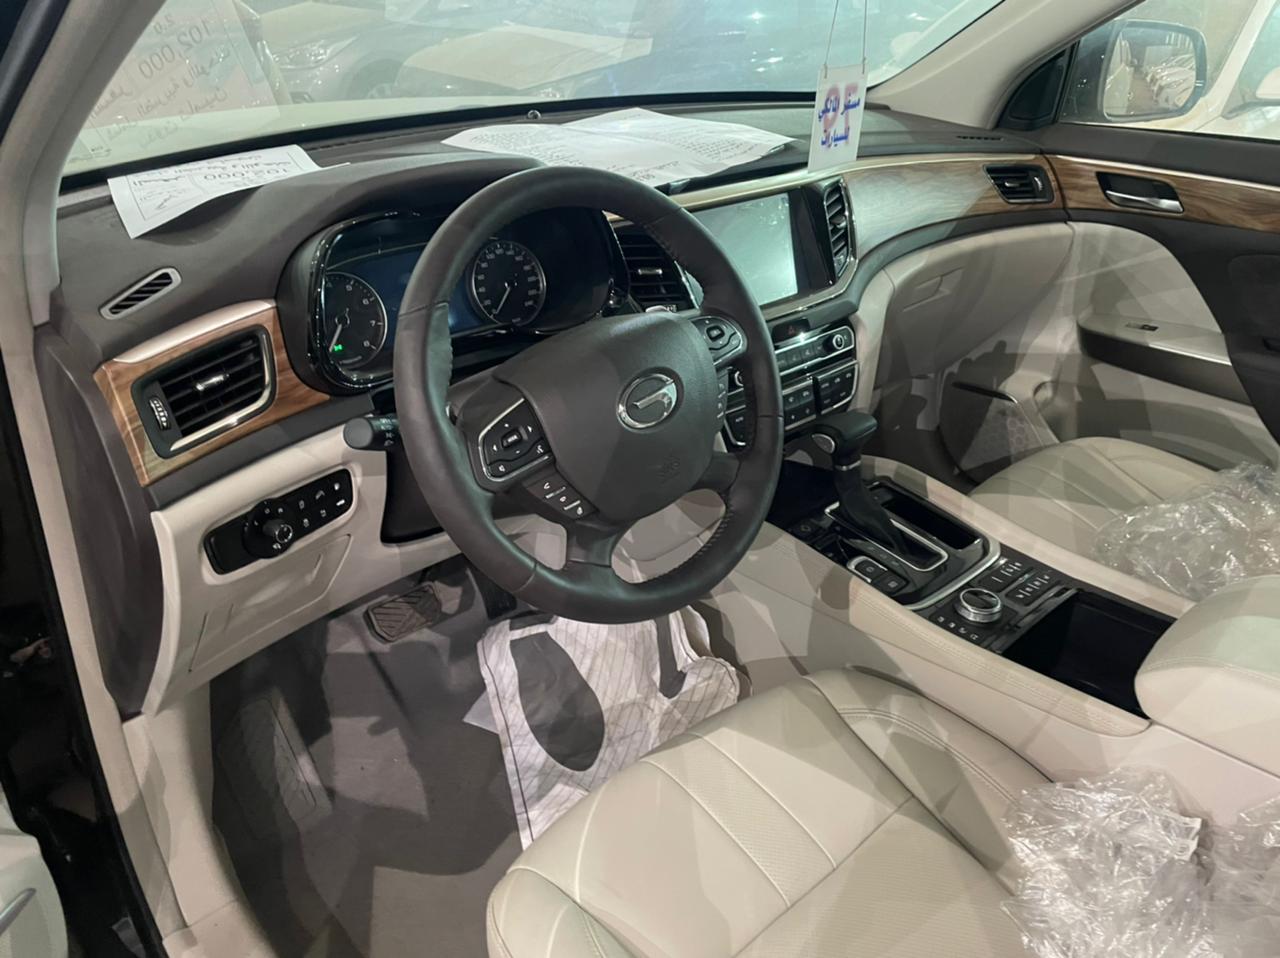 GAC فل  GS8  دبل 2020 سعودي جديد للبيع في جدة - السعودية - صورة كبيرة - 16